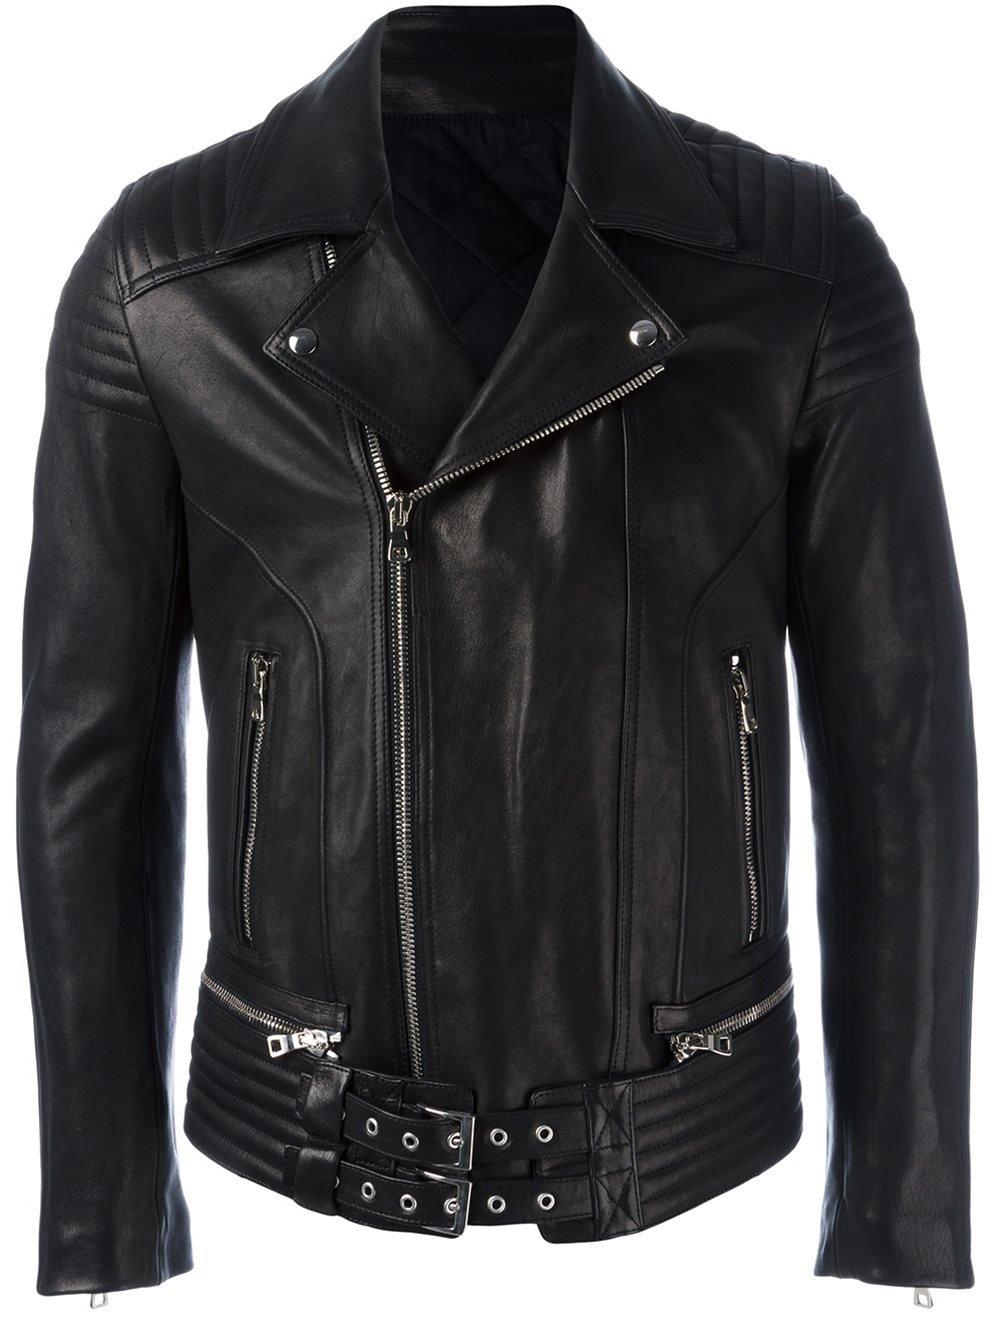 Aishang Men's Black Punk Leather Jacket Collarless Double Zipper Balmain Coat. by Aishang. $ $ 55 10 + $ shipping. tall rain jacket 8xlt mens shirts big and tall balmain shirt men Women's Hoodies, FORUU Casual Loose Long Sleeve Rainbow Print Pullover Blouse Shirts Sweatshirt.